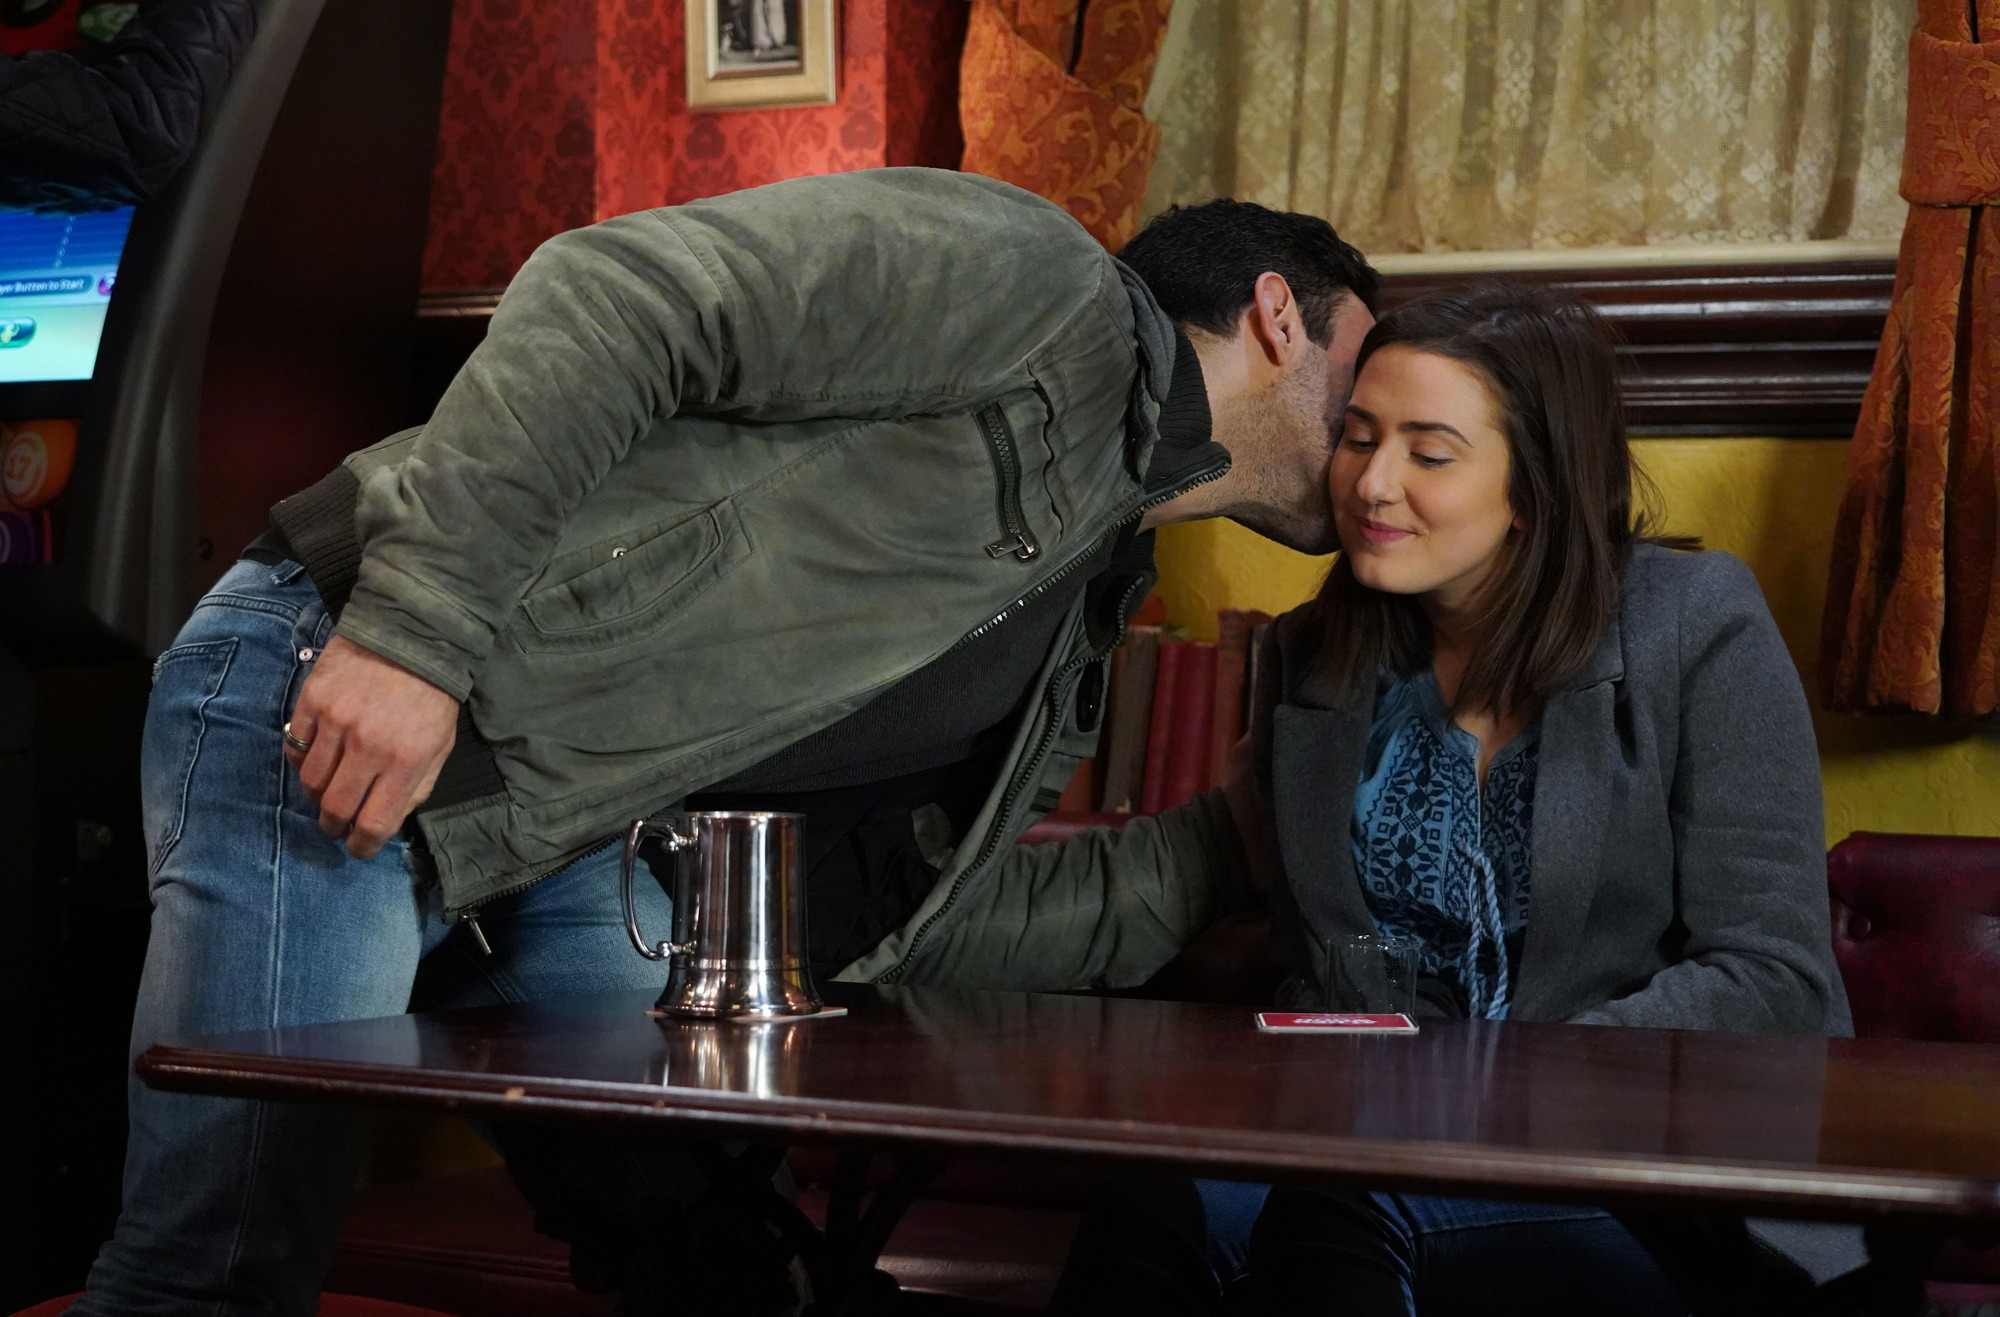 EastEnders spoilers: Kush Kazemi sleeps with a drunk Bex Fowler?